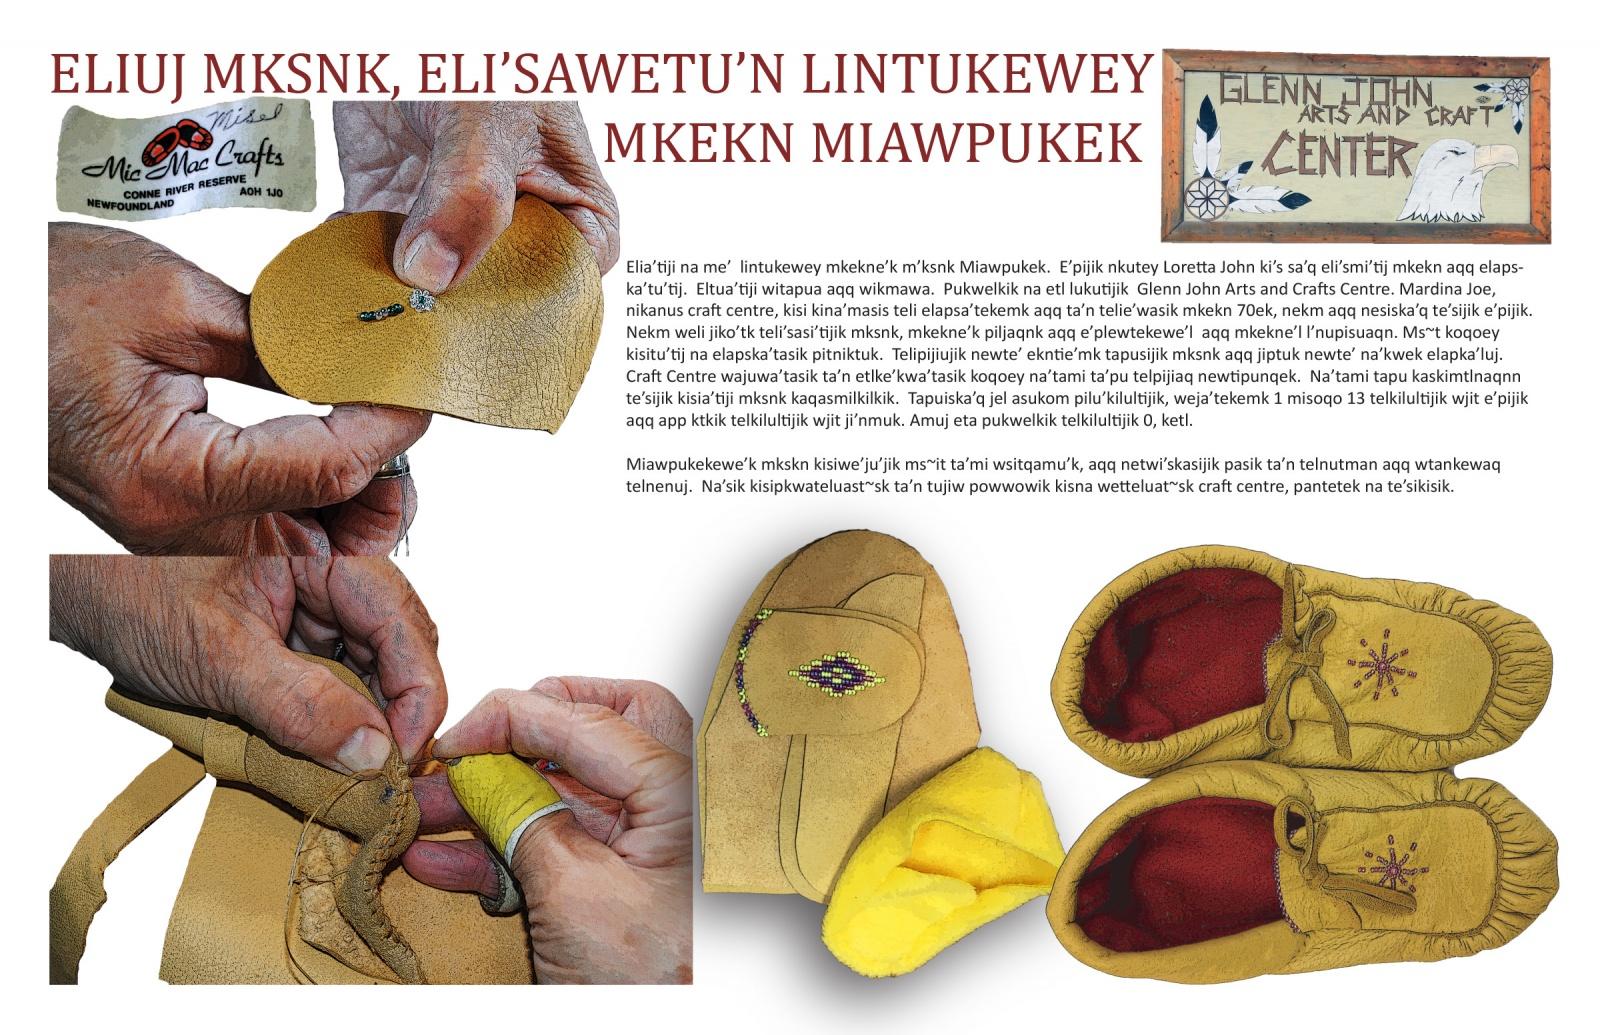 Eliuj Mksnk, Eli'sawetu'n Lintukewey Mkekn Miawpukek